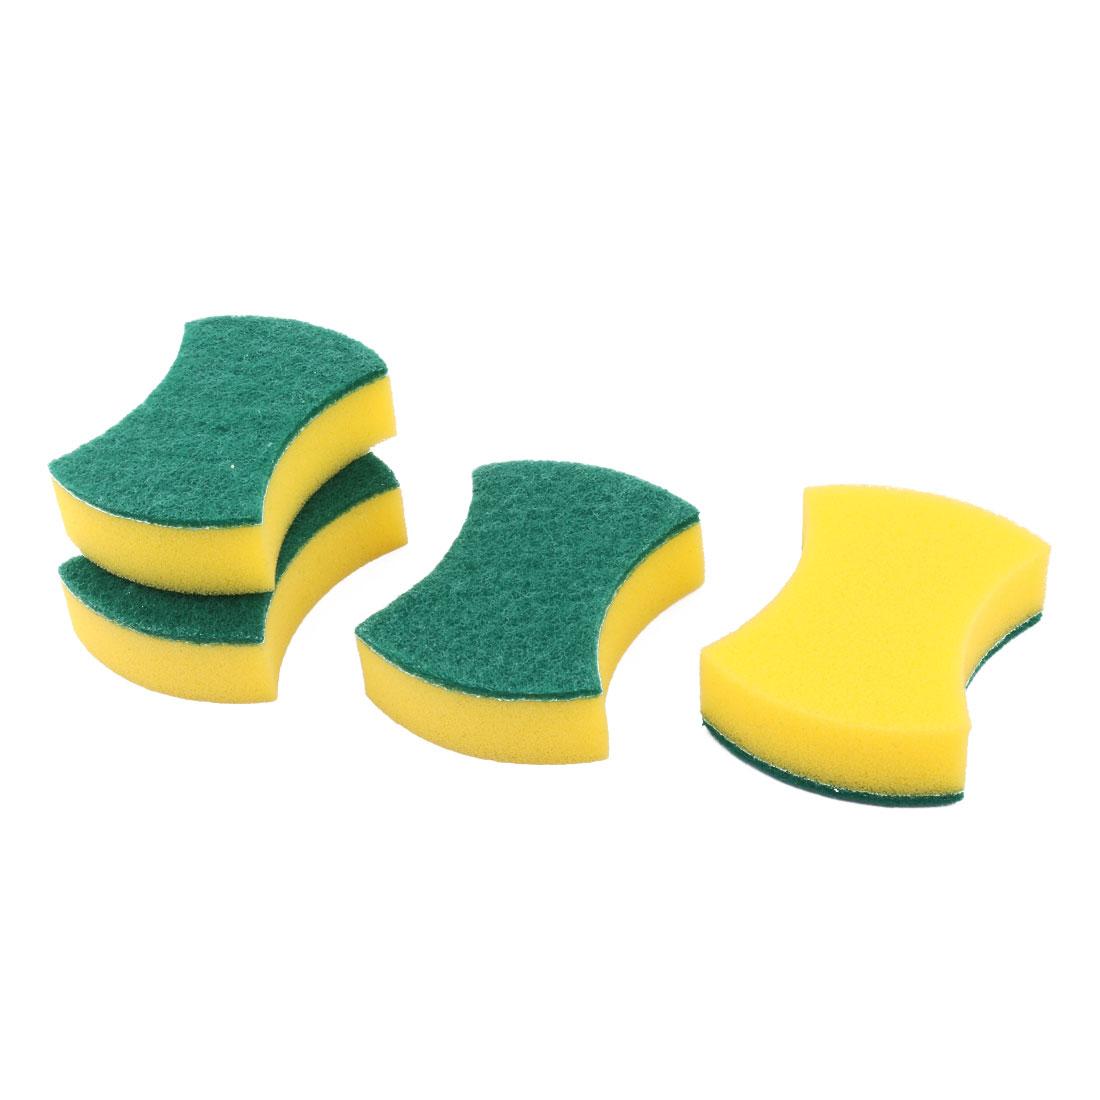 Home Sponge Bowl Plate Washing Tool Pot Pan Dishes Cleaning Pad Brush 4pcs